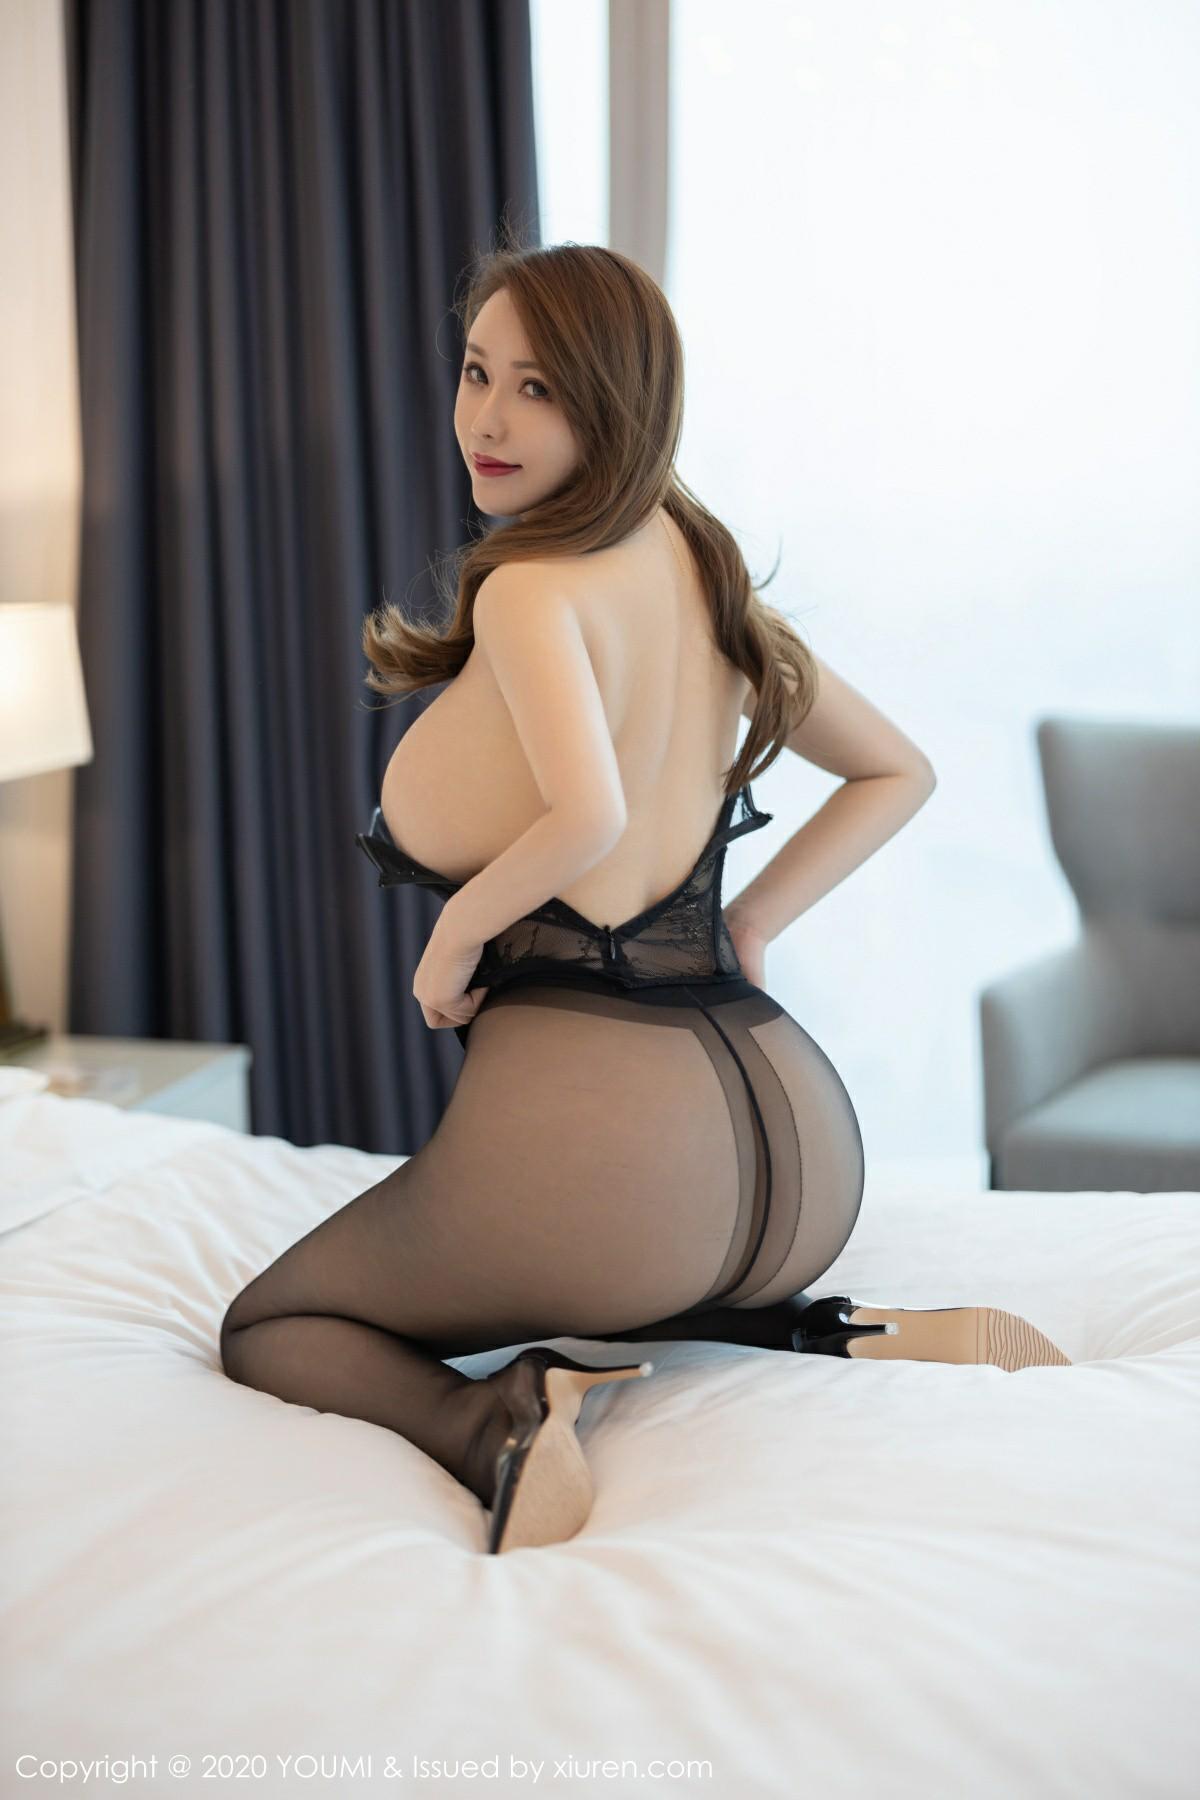 [YOUMI尤蜜荟]2020.04.03 VOL.447 Egg 尤妮丝Egg[56P] 尤蜜荟 第3张